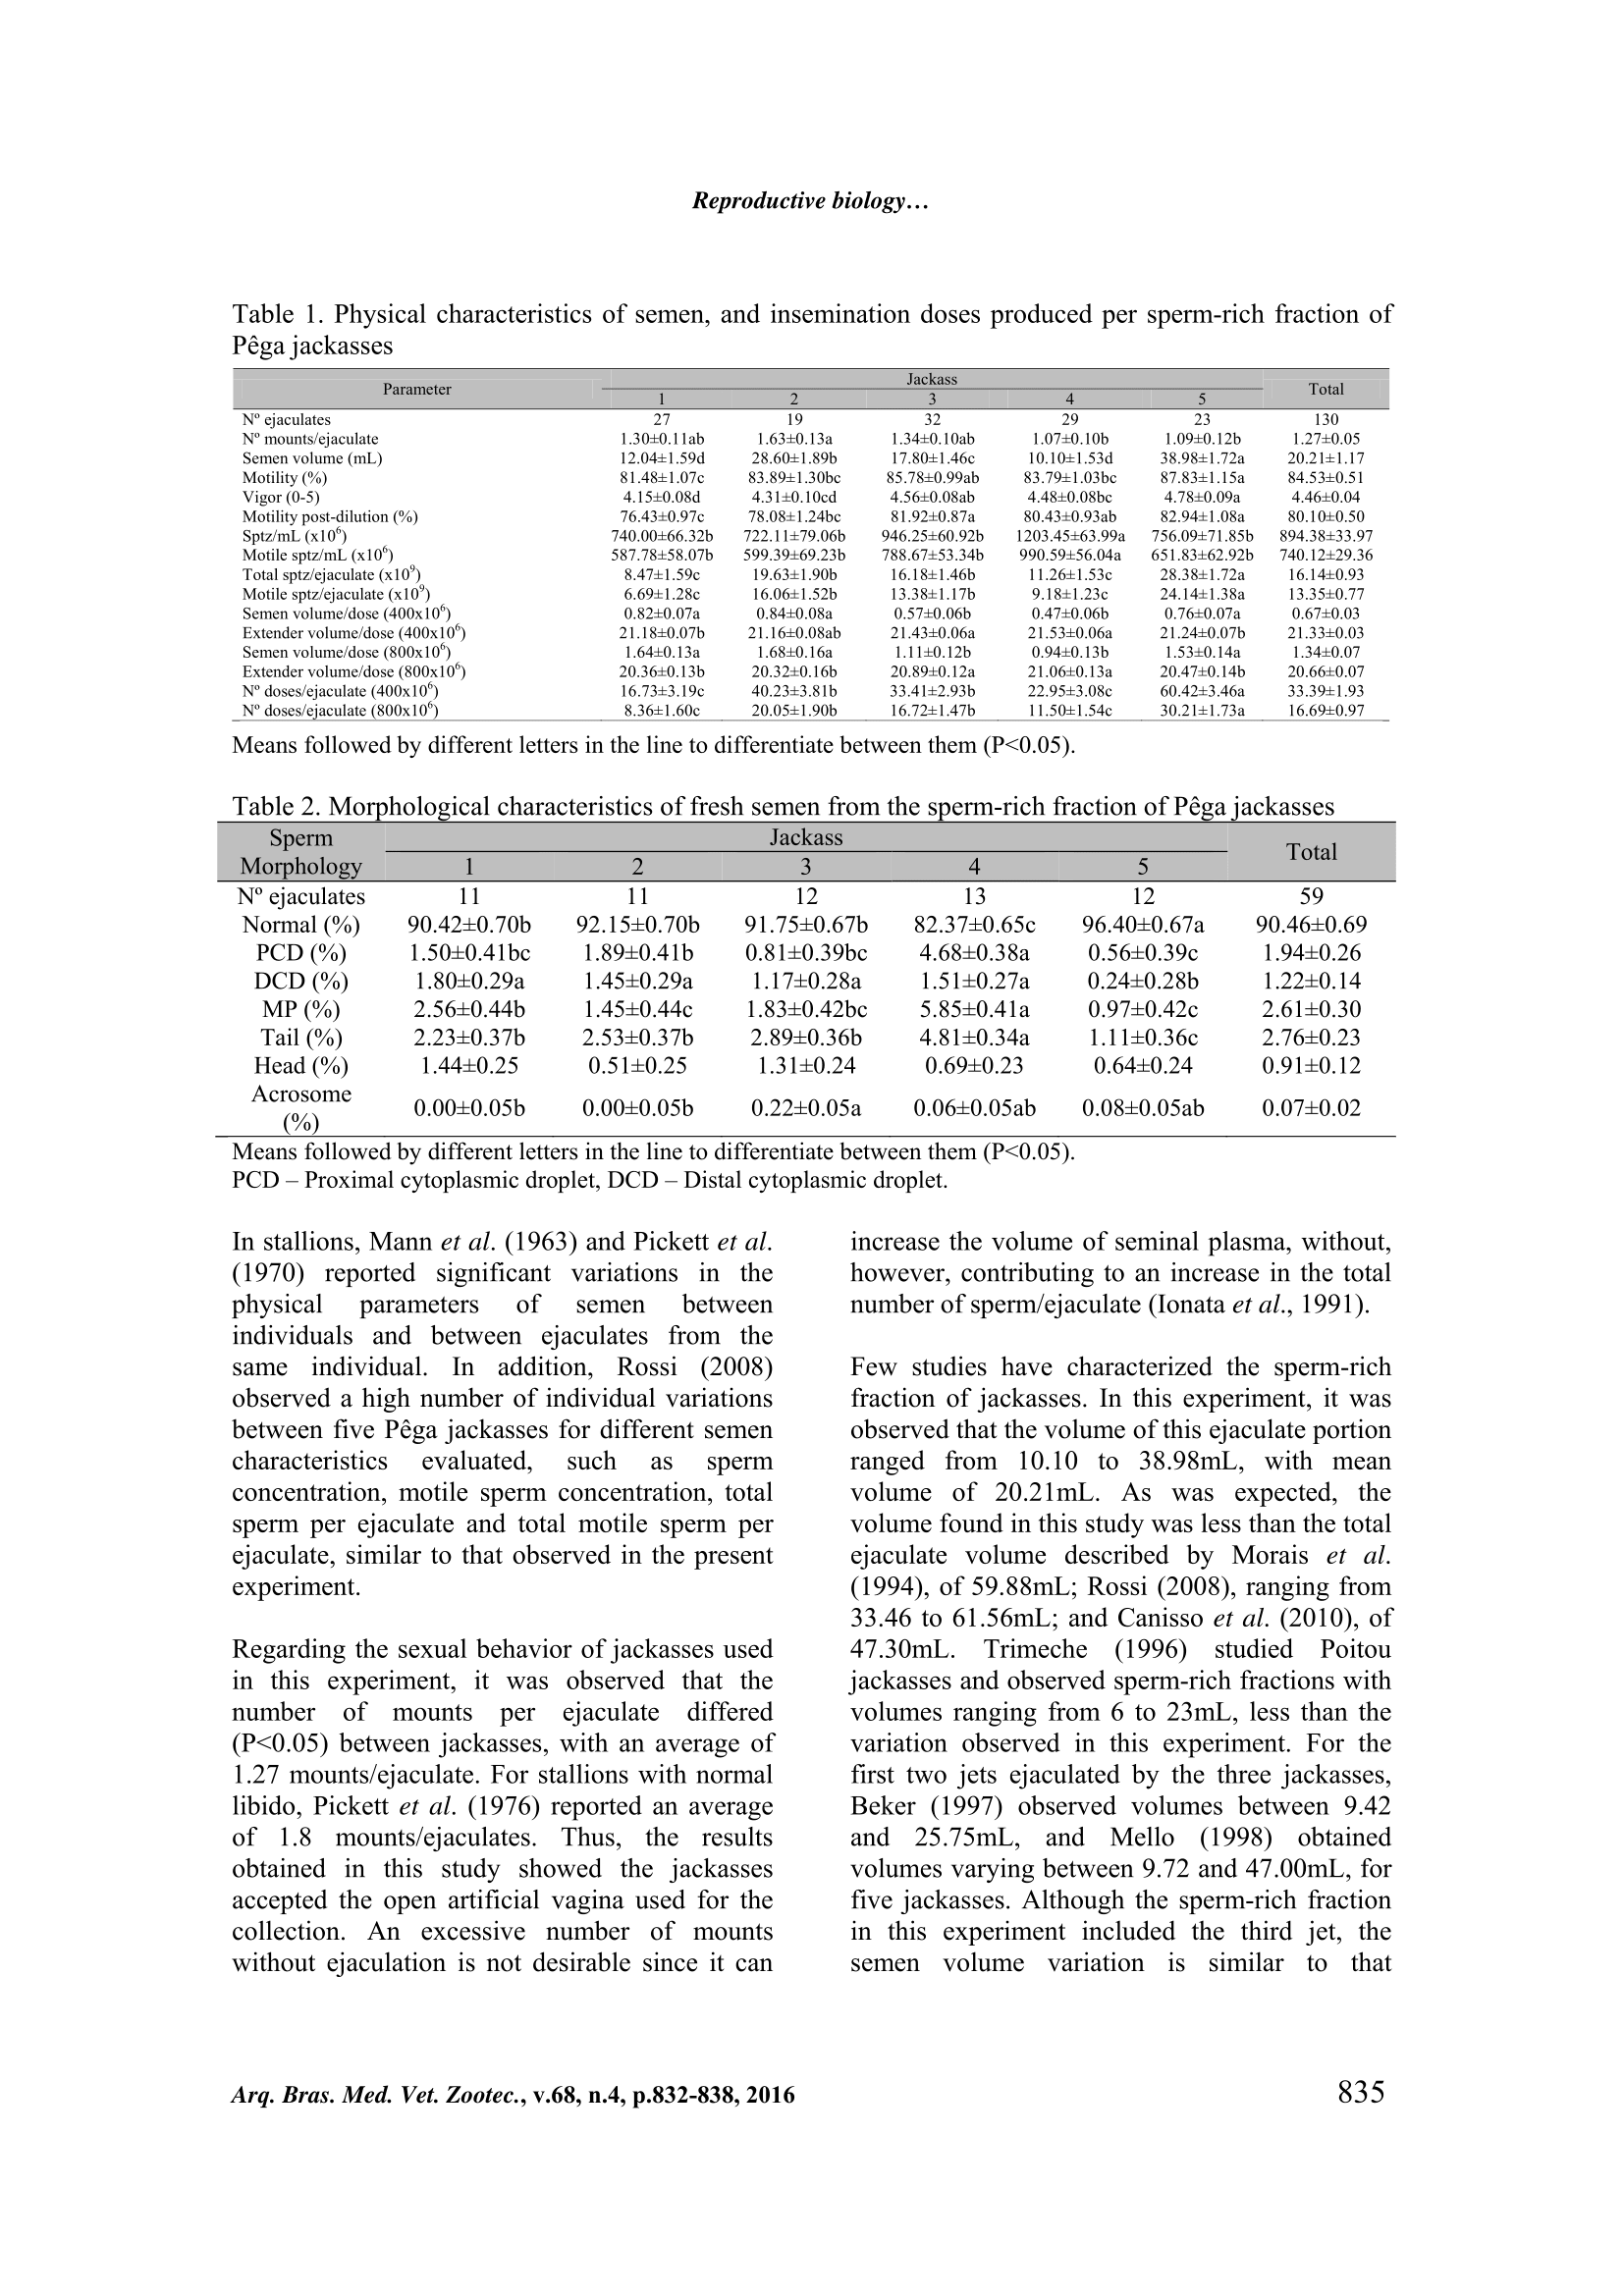 AMA 1-4 (1).png